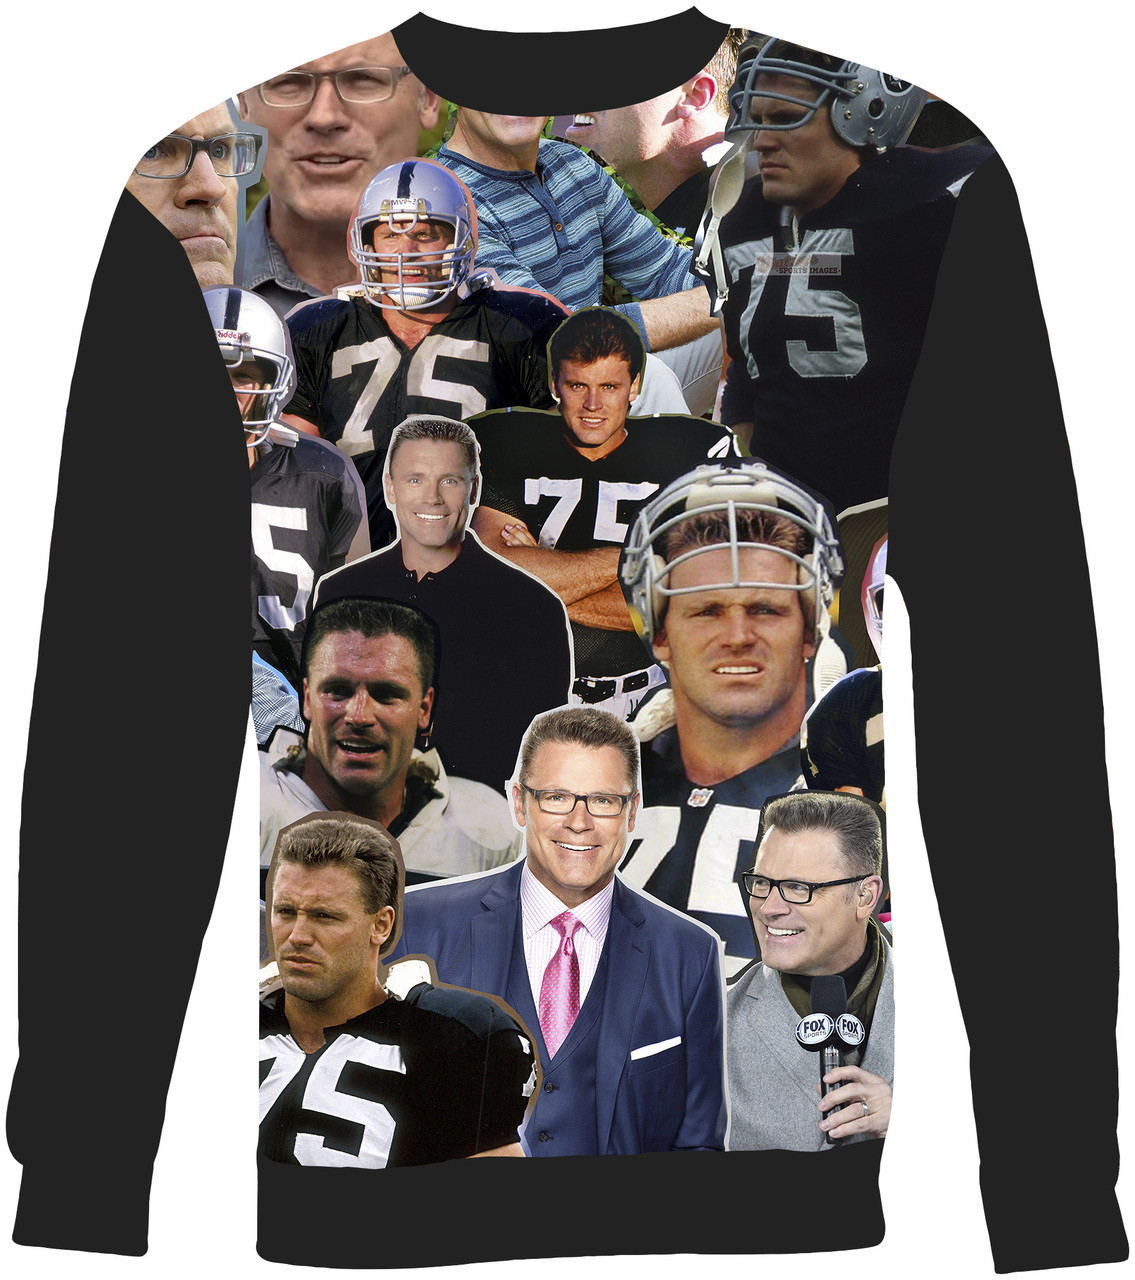 Howie Long Collage Sweater Sweatshirt - Subliworks b42ecd026